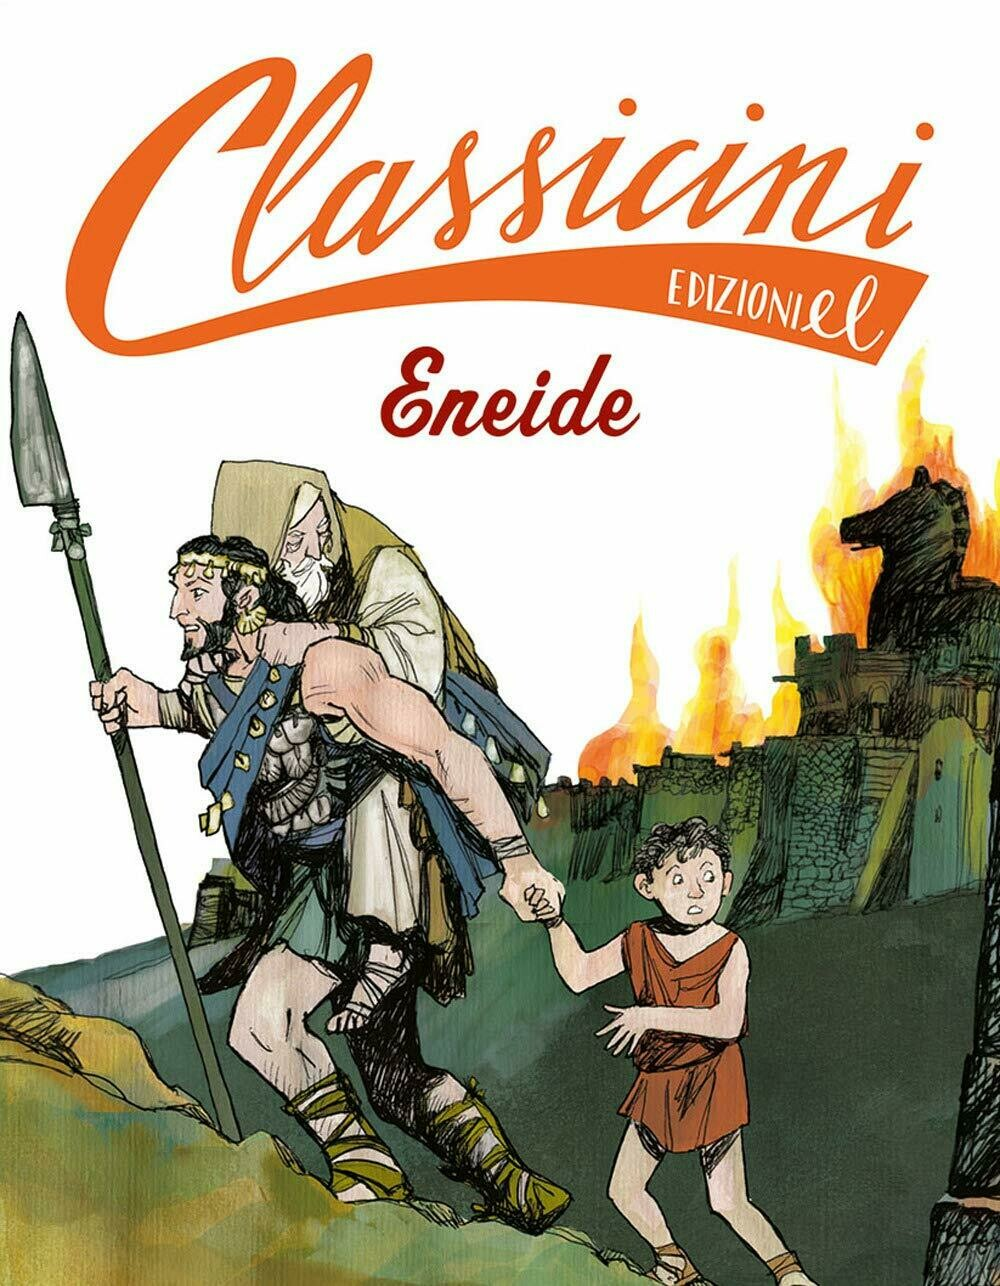 Eneide. Classicini